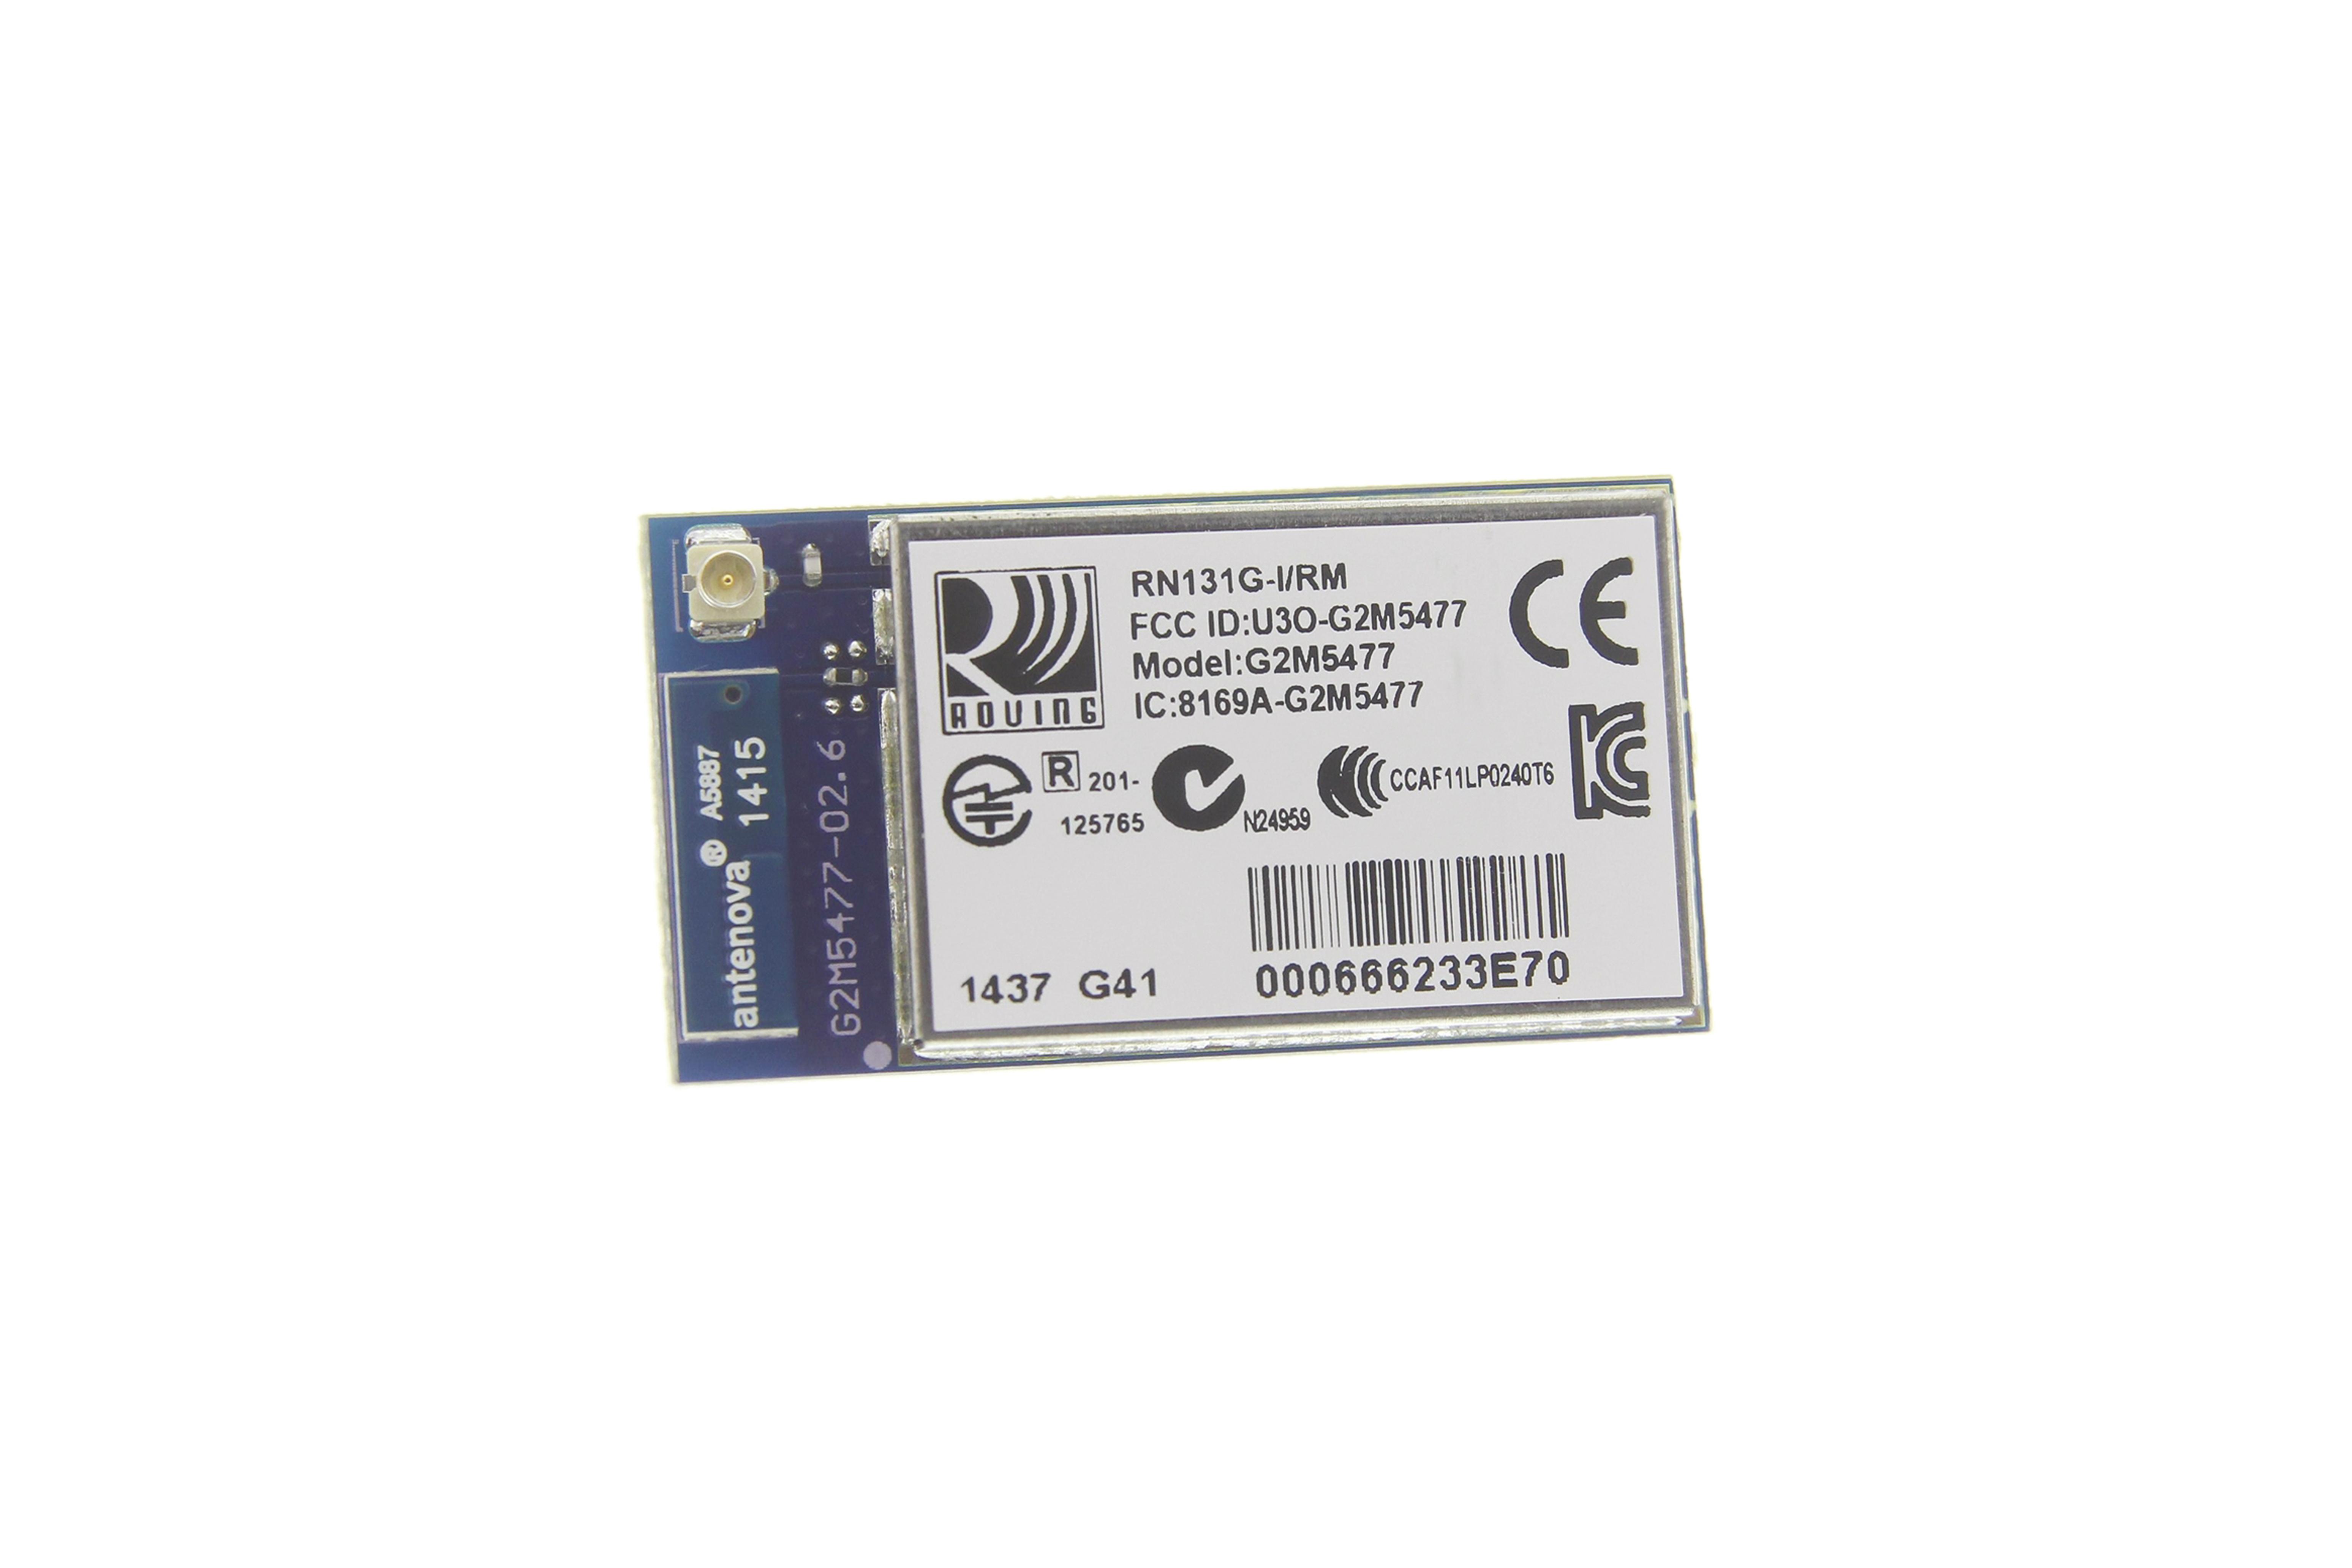 WiFi 802.11 b/g SMD-Modul mit U.FL